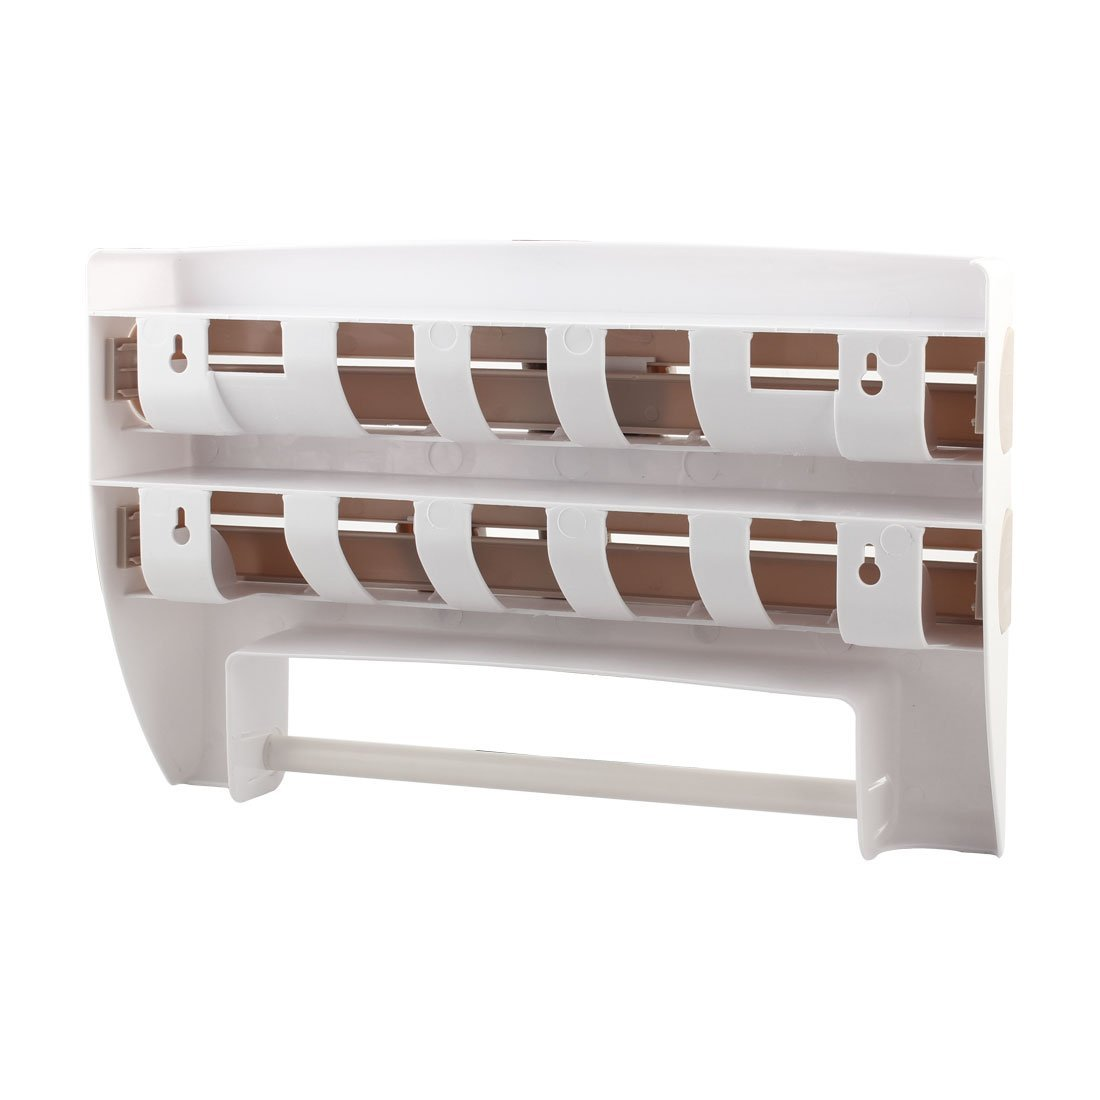 Amazon.com: eDealMax Cocina abrigo del alimento del papel de aluminio Dispensador estante de especia de montaje en pared de toallas de papel titular: ...